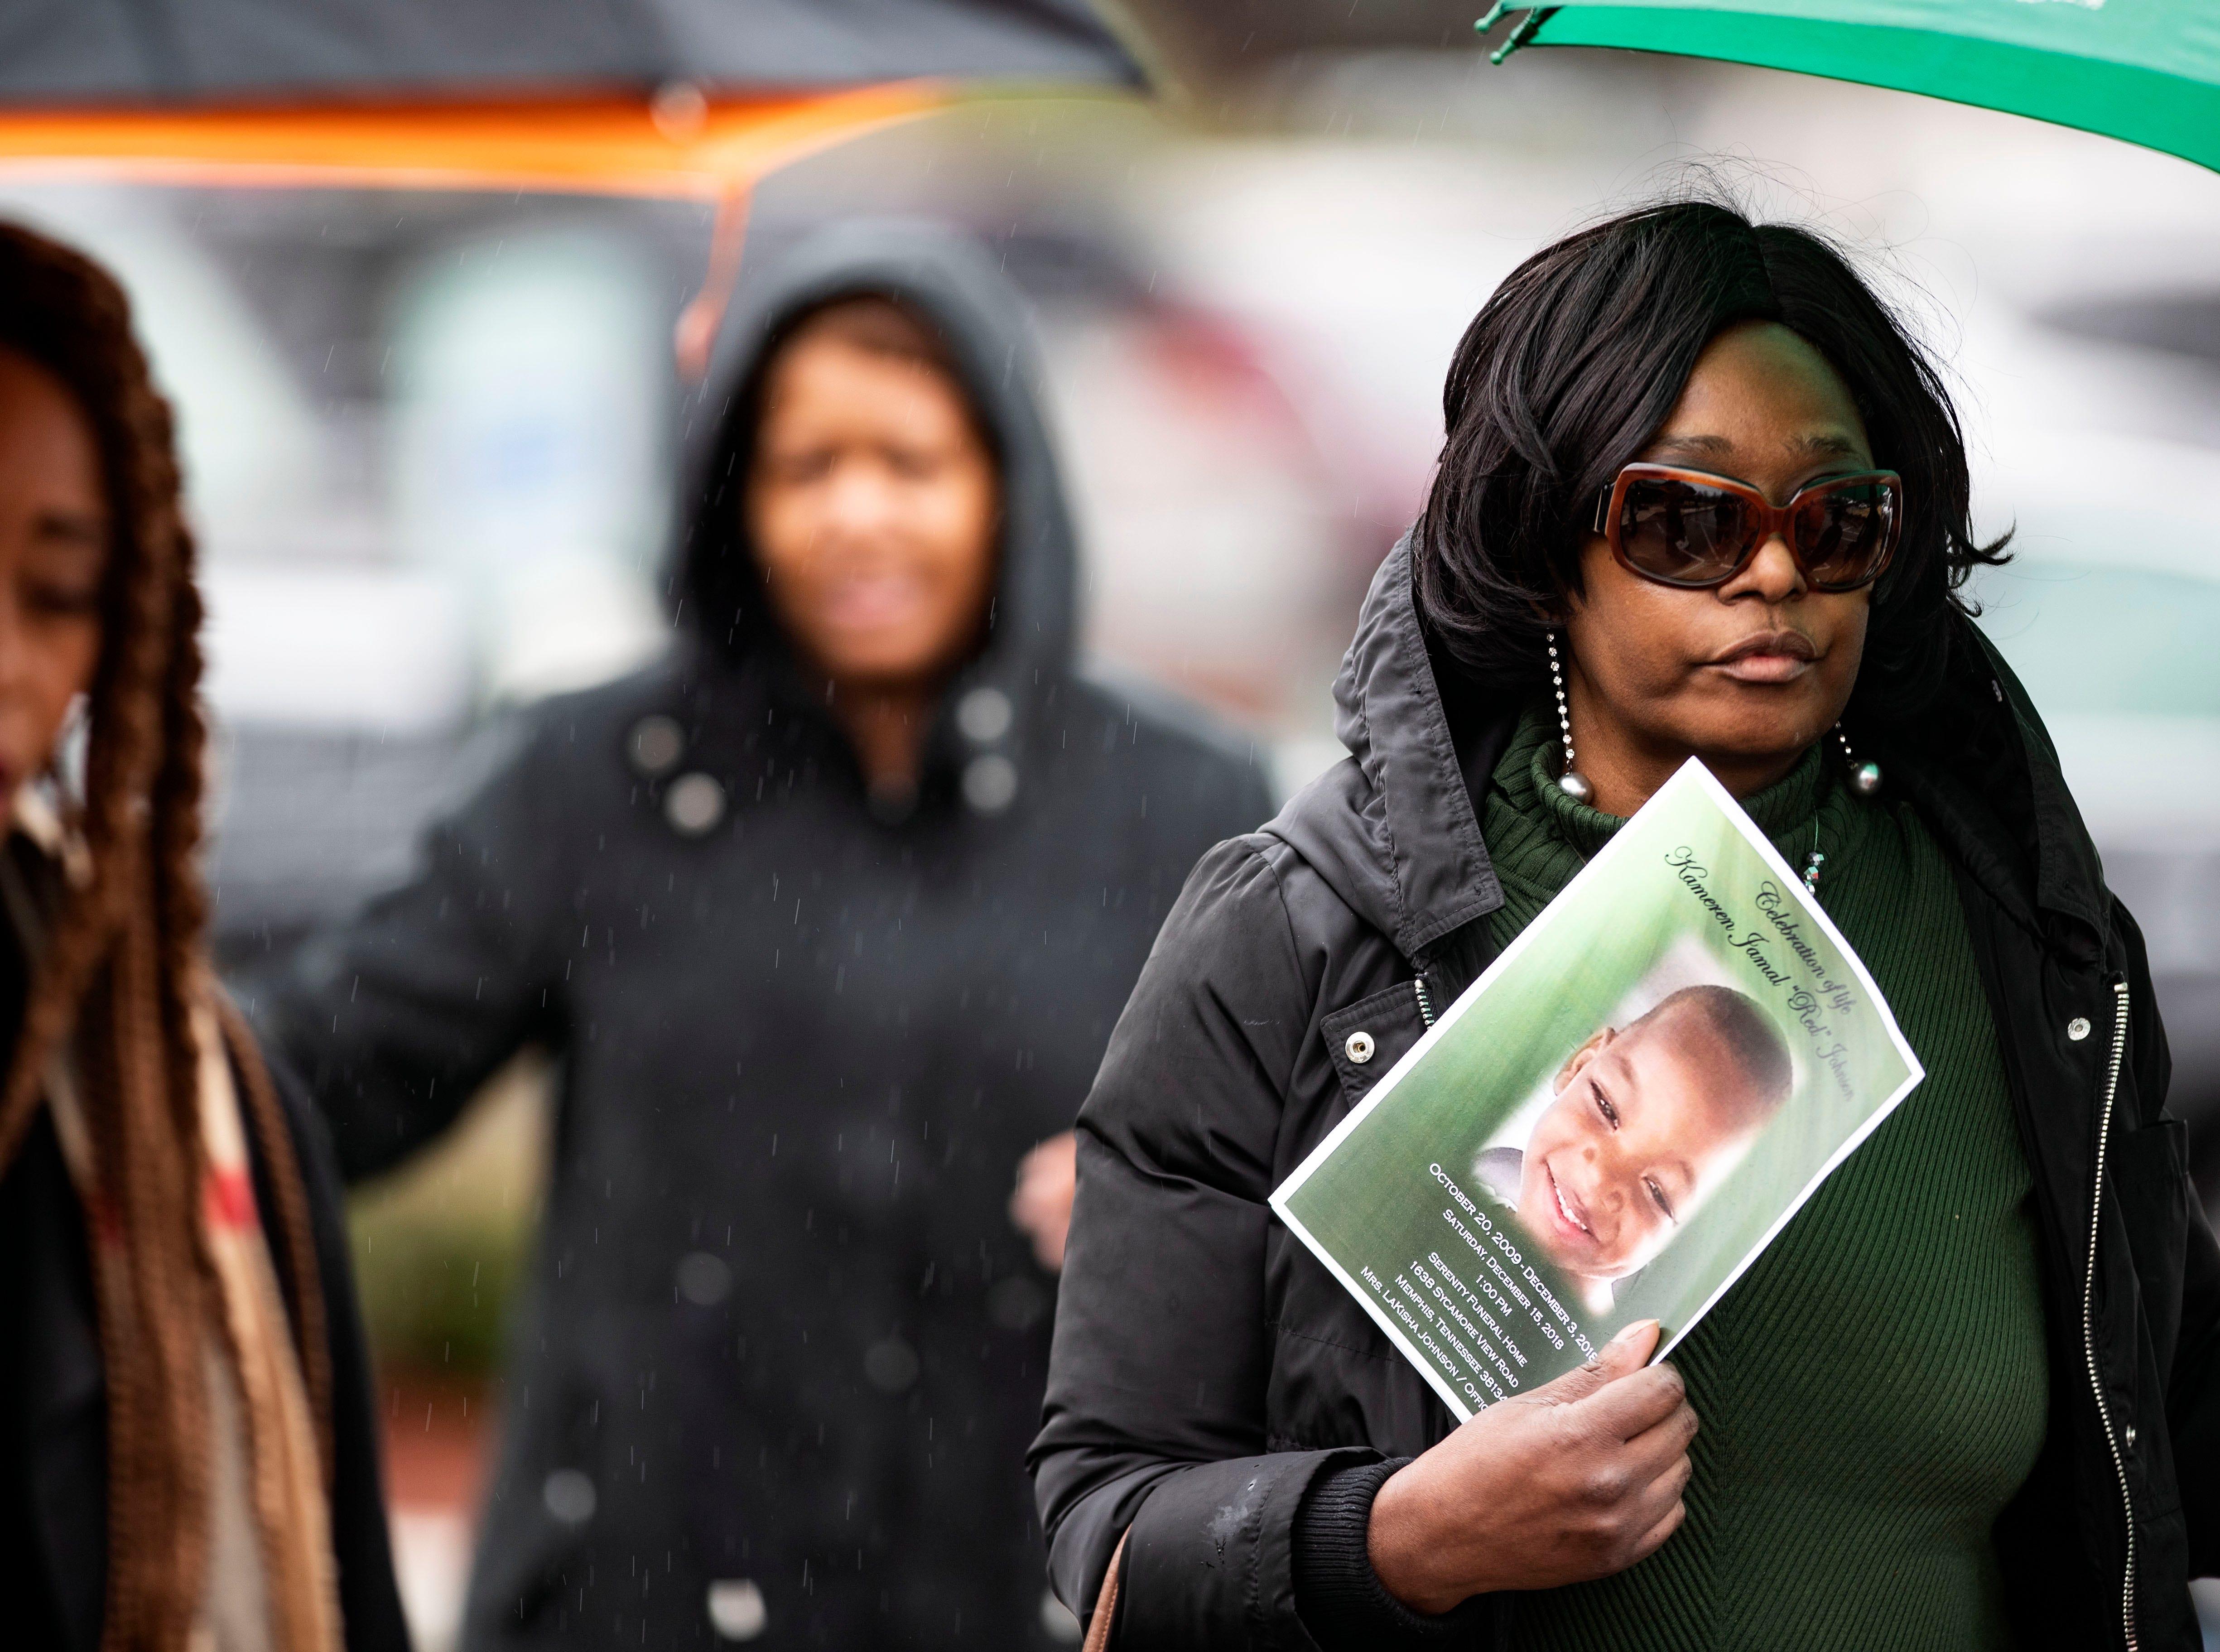 Attendants of 9-year-old Kameren Johnson's funeral, walk under umbrellas to burial site, Saturday, Dec. 15, 2018.